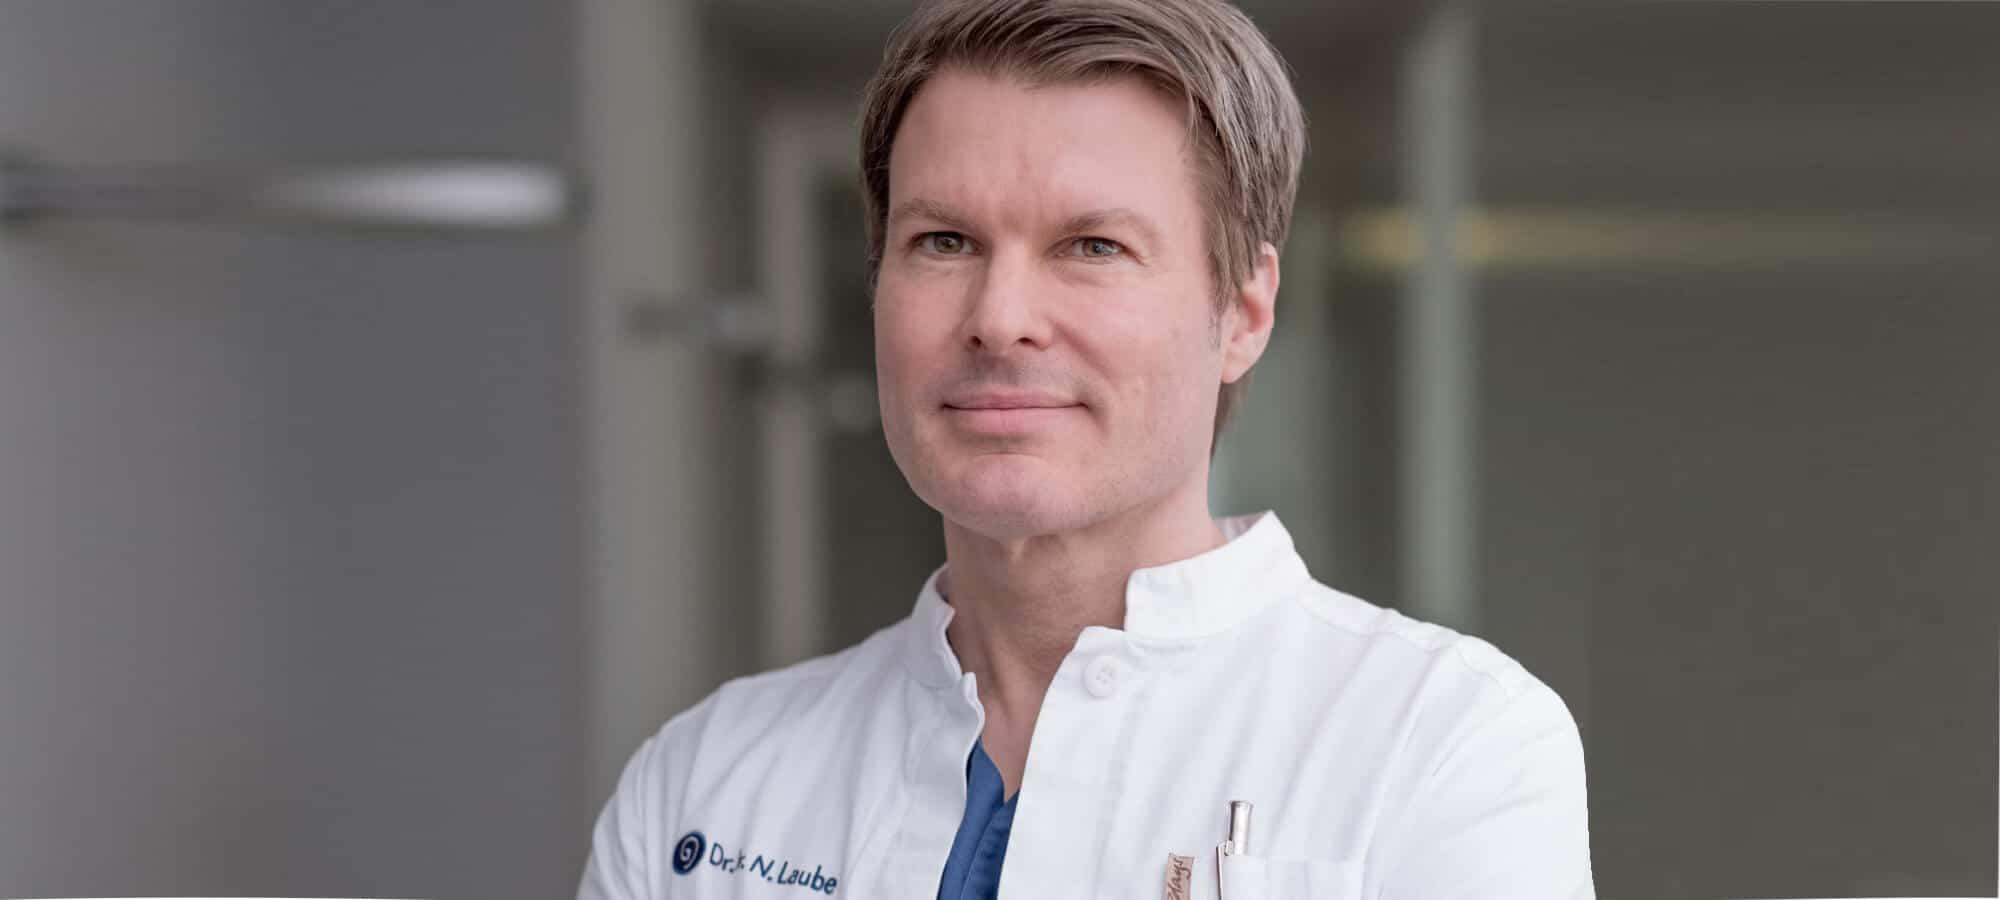 Dr. Dr. Nico Laube in Frankfurt | groisman & laube